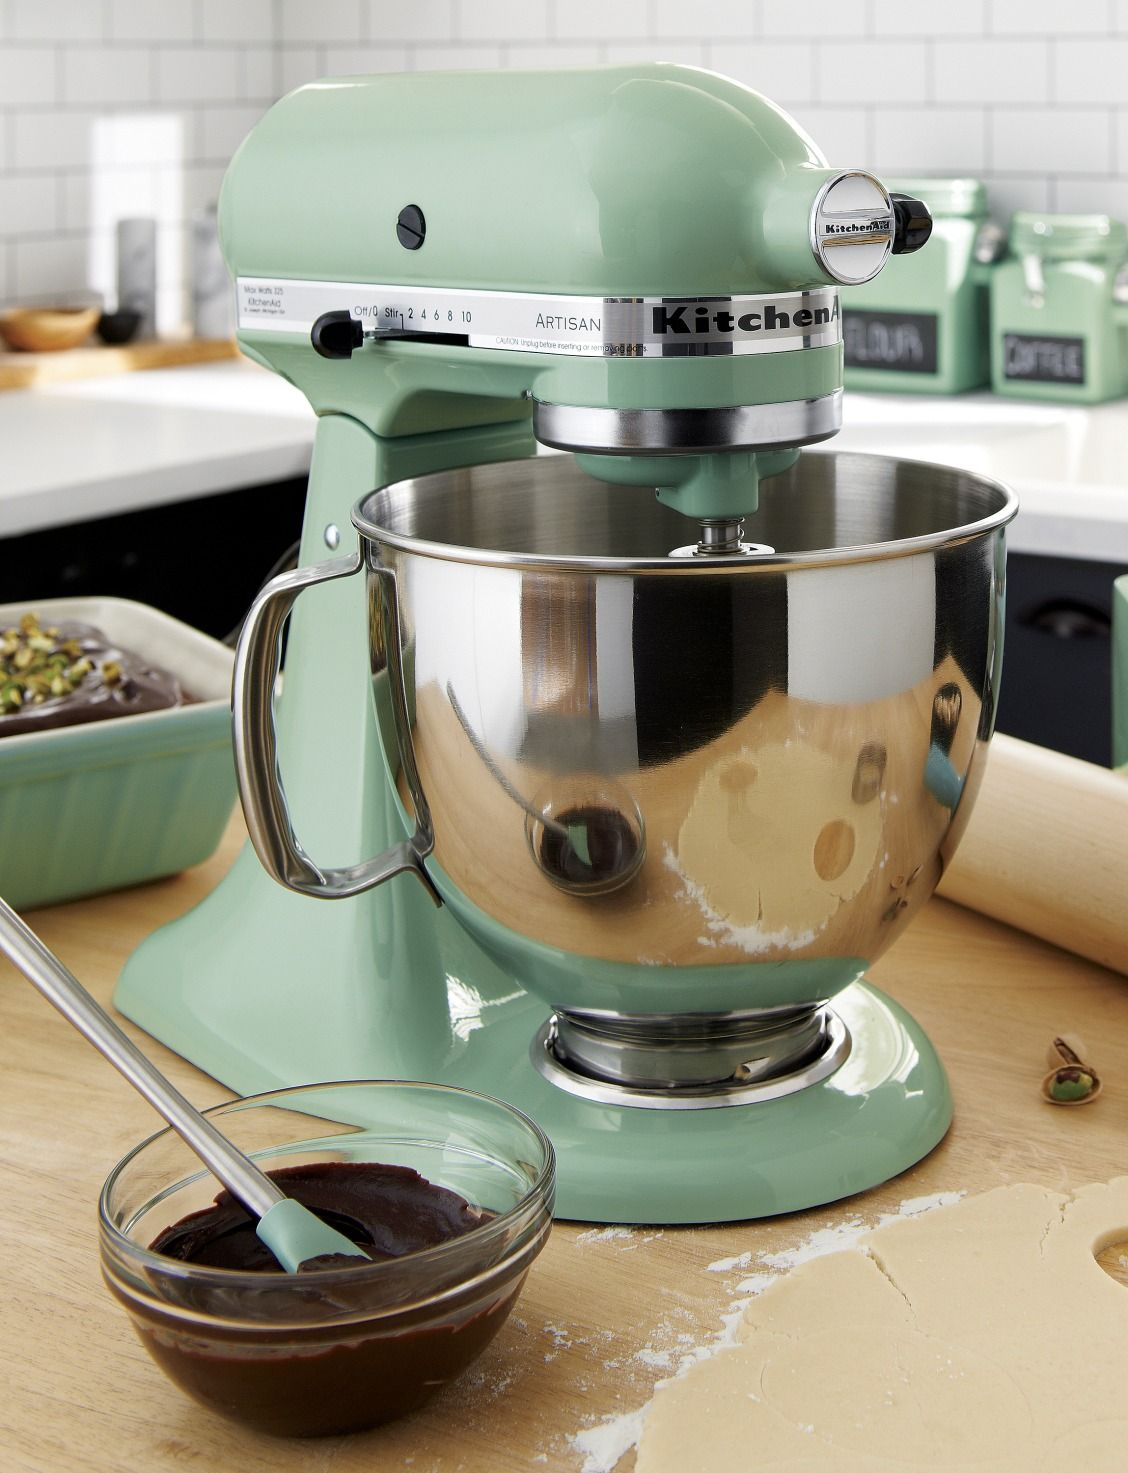 Kitchenaid Ksm150pspt Artisan Pistachio Stand Mixe Reviews Crate And Barrel Kitchen Aid Kitchenaid Artisan Green Kitchen